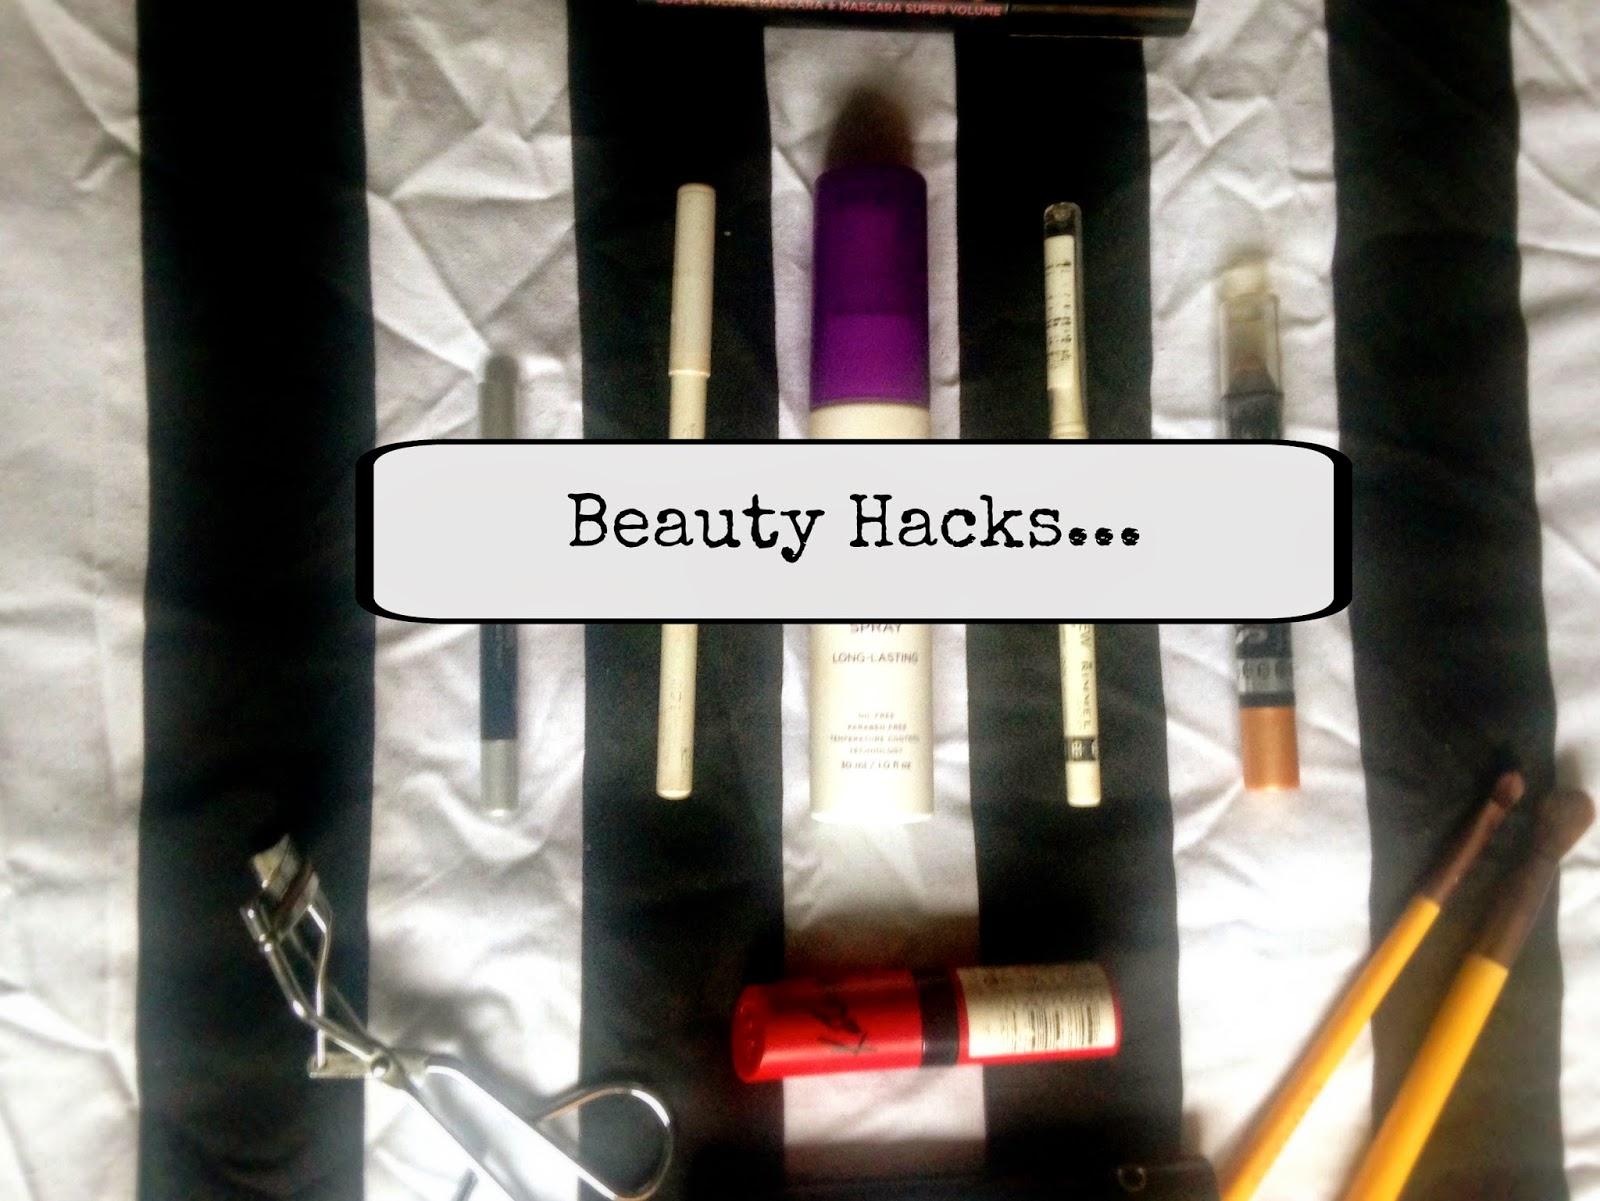 Beauty Hacks Title Picture